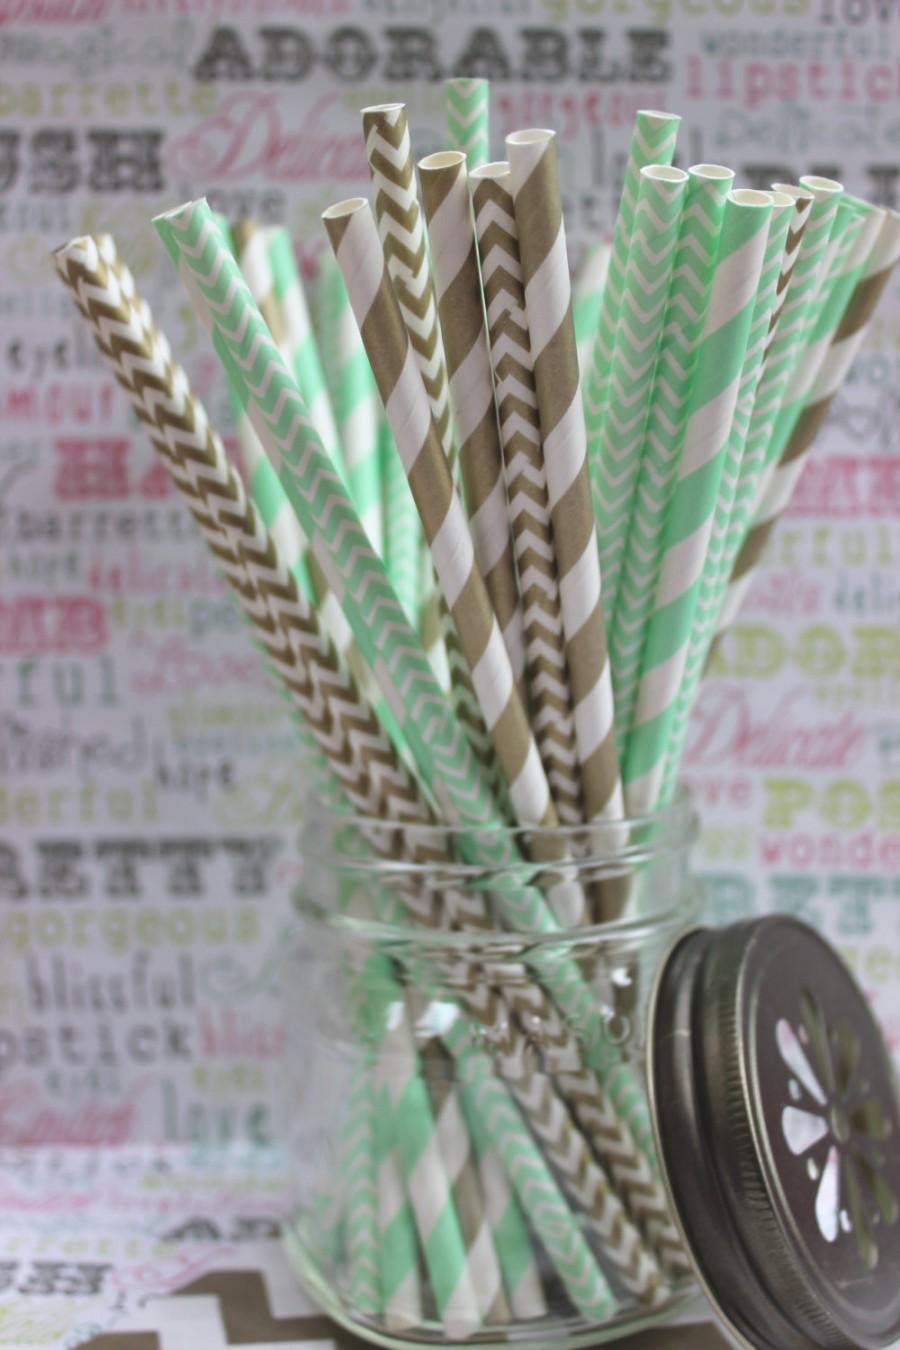 زفاف - 100 Mint Green and Gold Straws in Stripes and Chevron Combo, 25 ea. design, Mint Green and Gold Wedding Straws - Printable DIY Flags